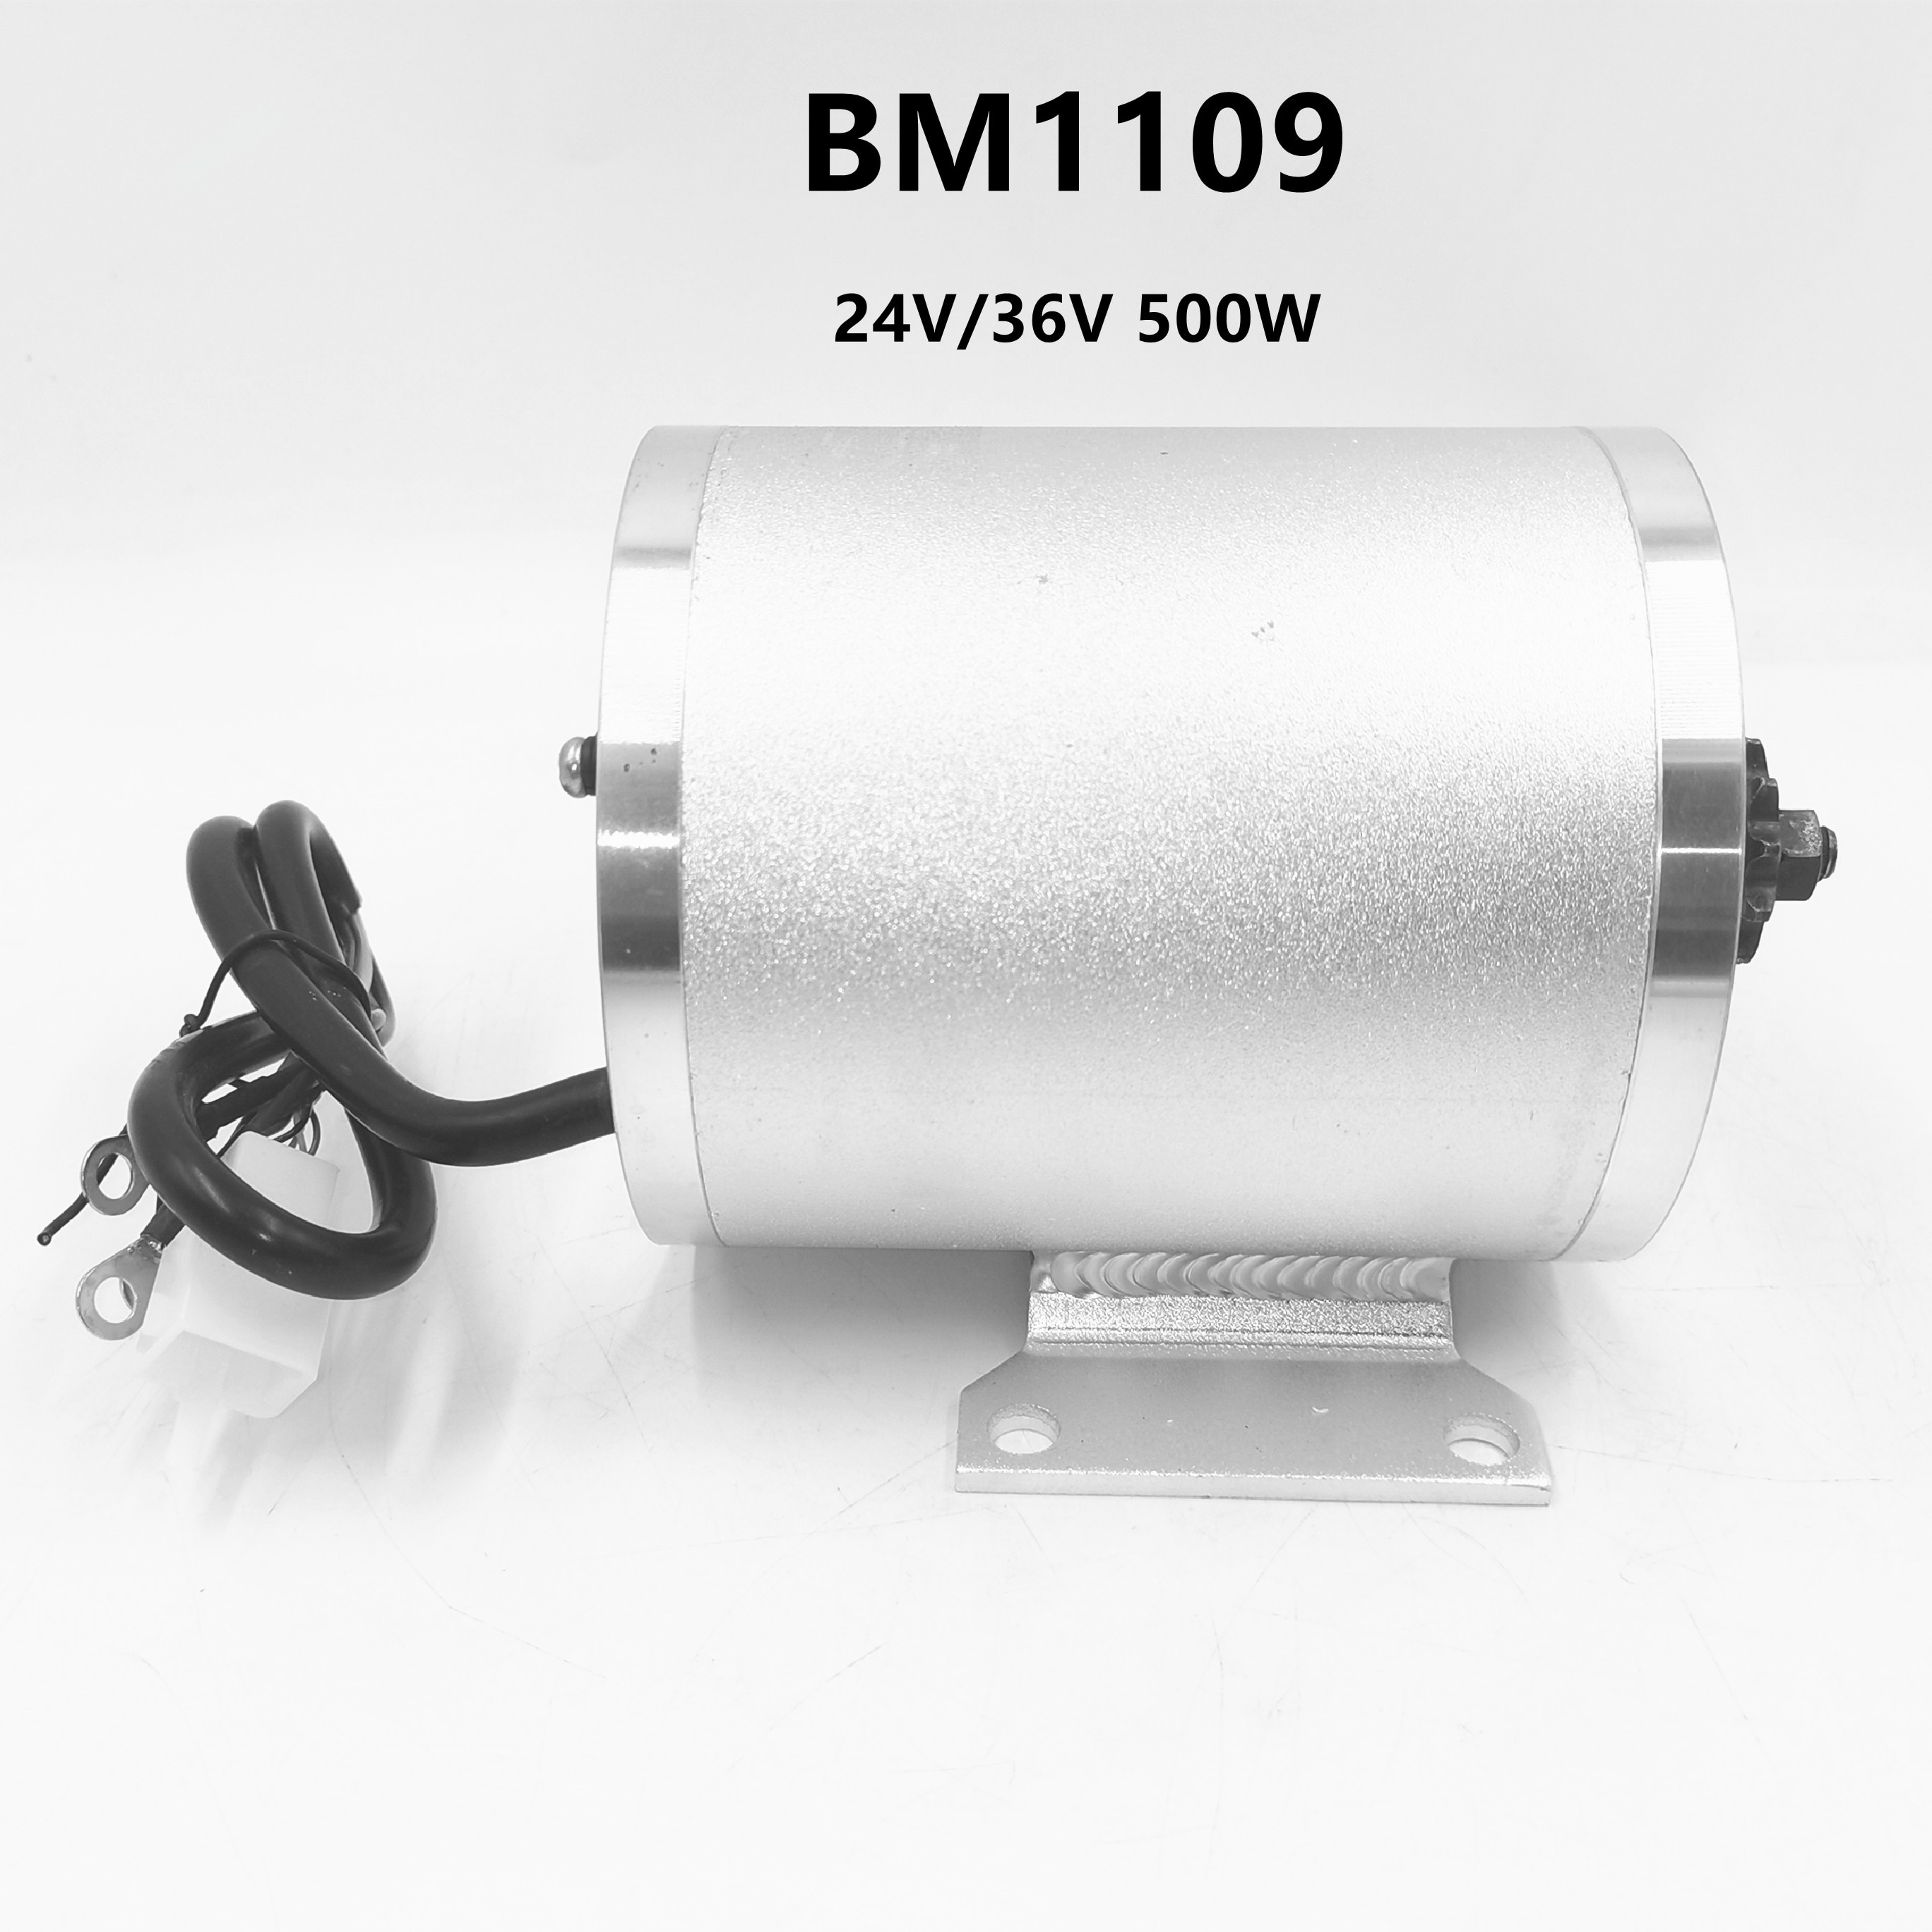 BM1109 500 واط 36 فولت 48 فولت تجديد محركات كهربية فرش عالية السرعة لتقوم بها بنفسك موتور تيار مباشر ل Ebike التنقل العربة تعديل السيارة